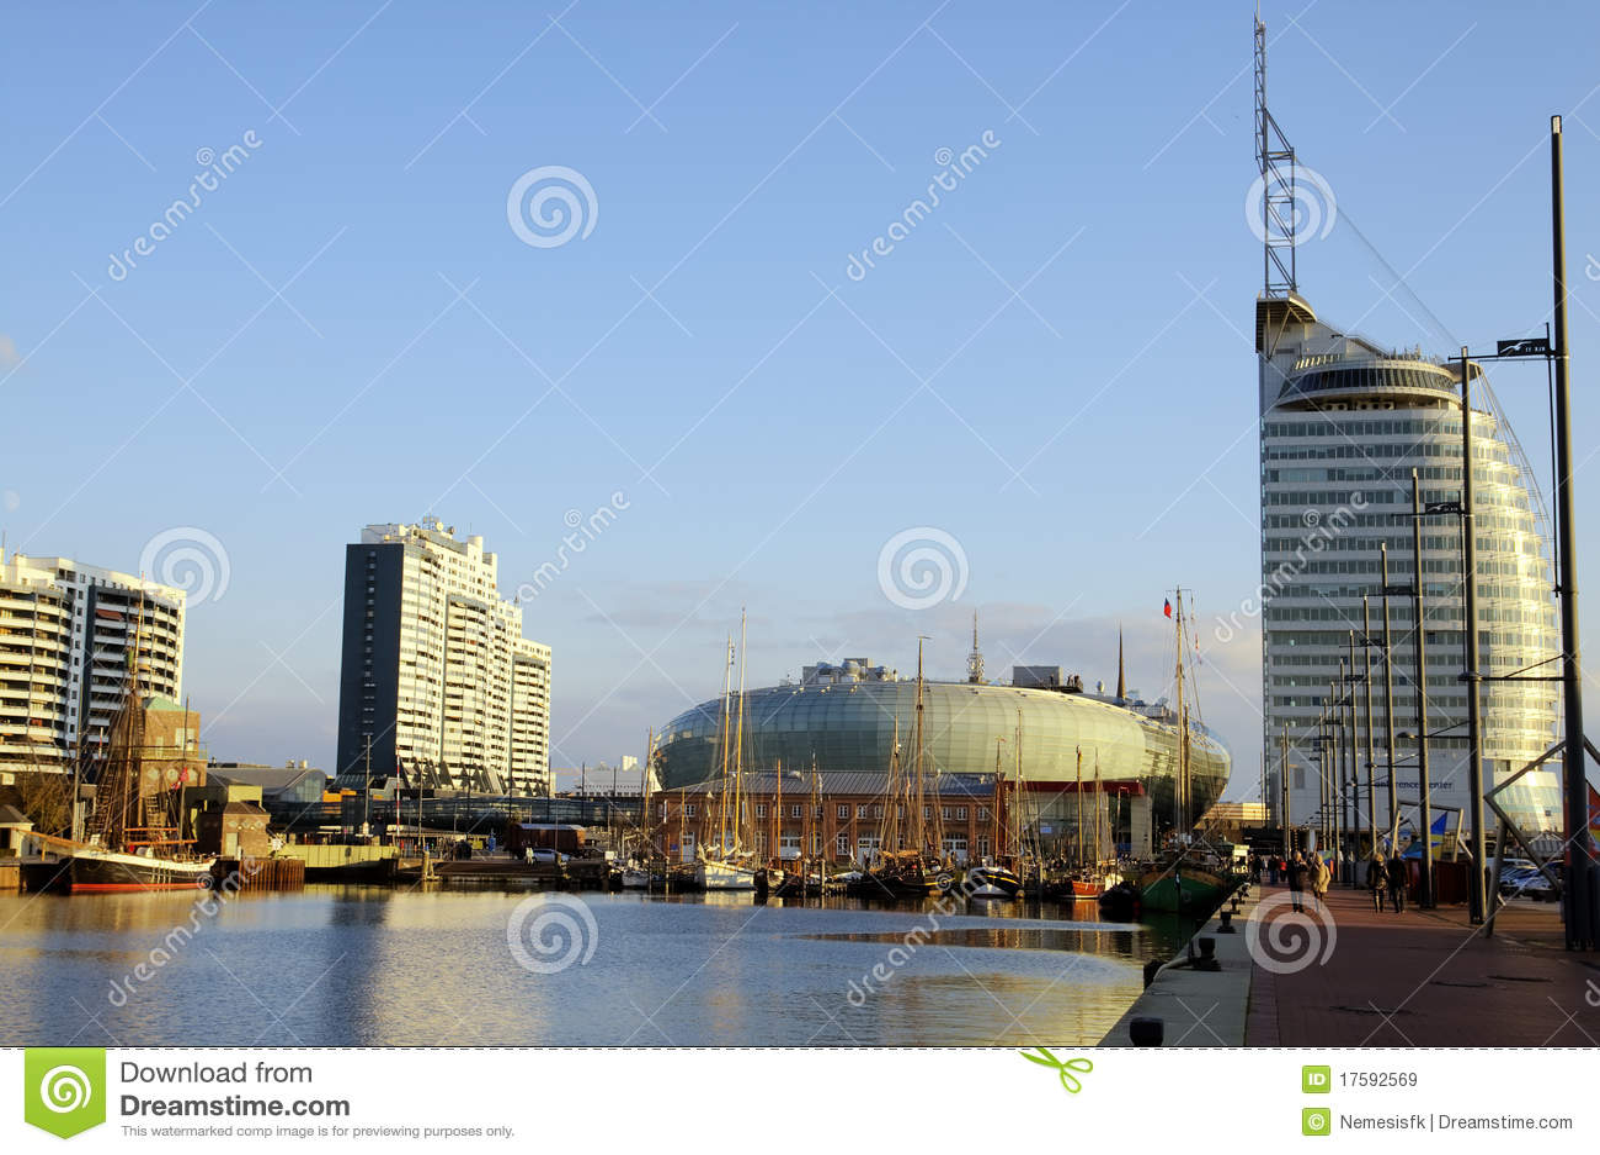 Klimahaus atlantische hotel segel stadt bremerhaven for Design hotel bremerhaven